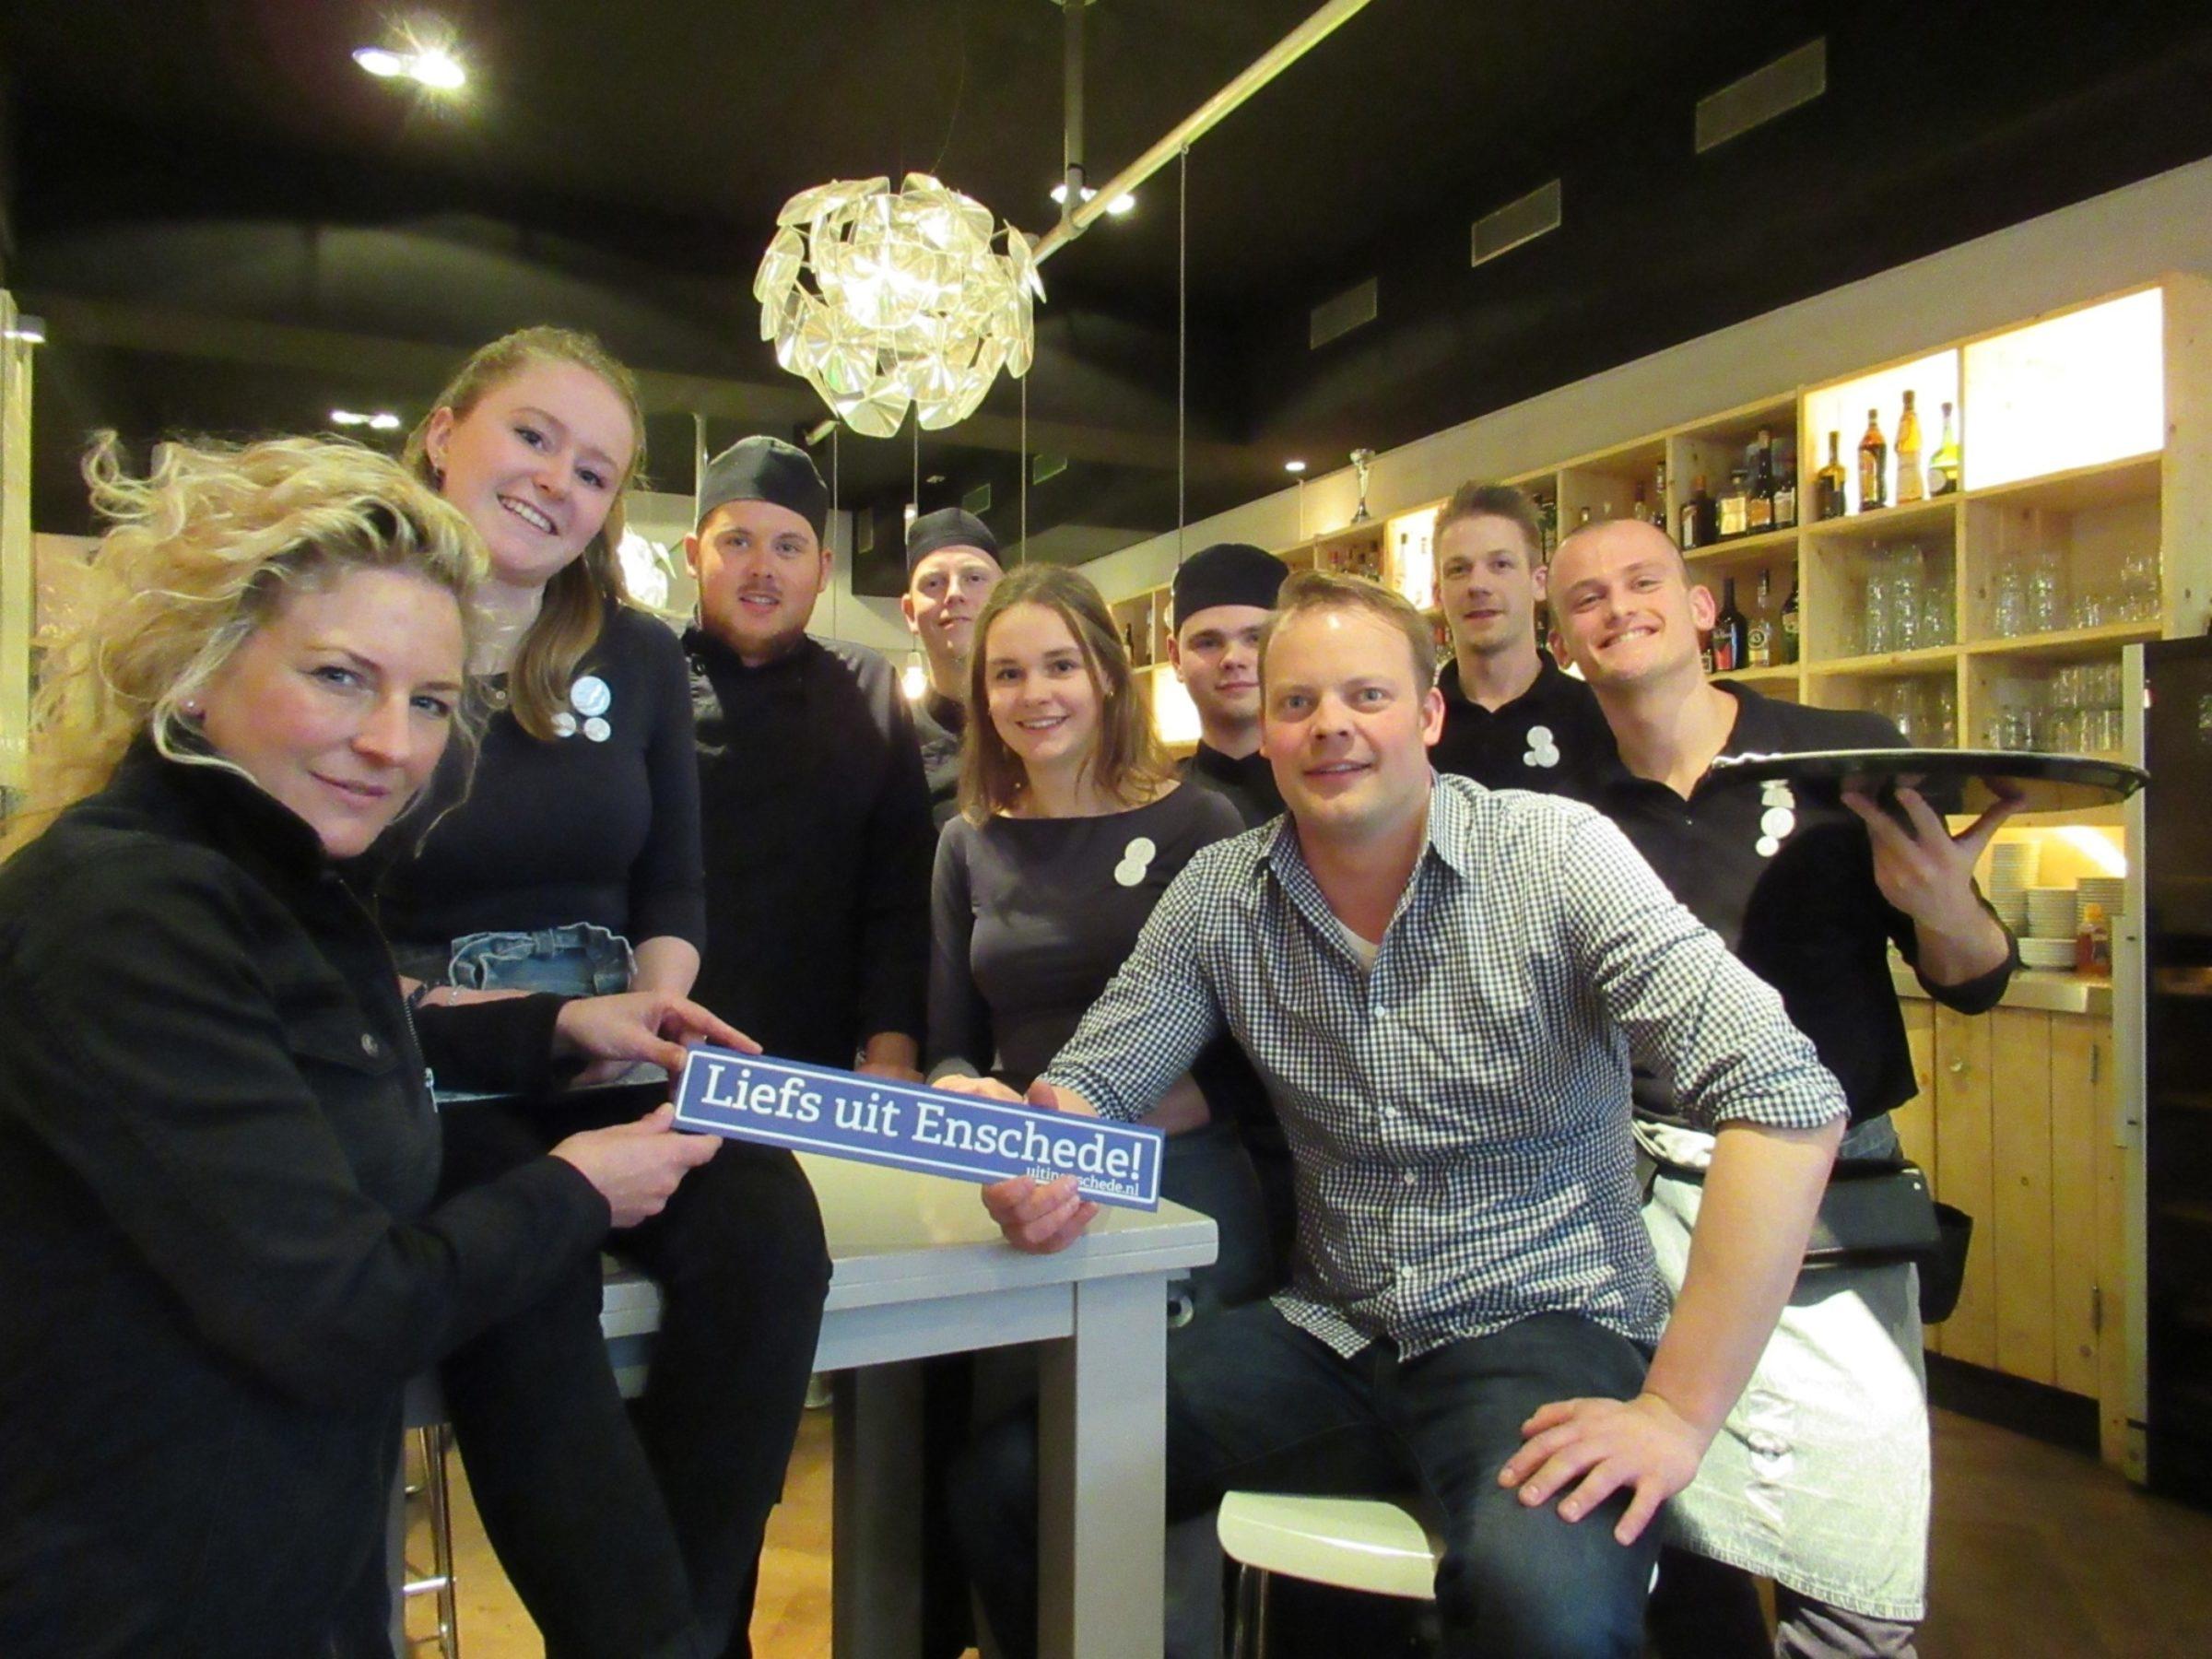 2018 Liefs Uit Enschede Novi Marketing En Campagnes